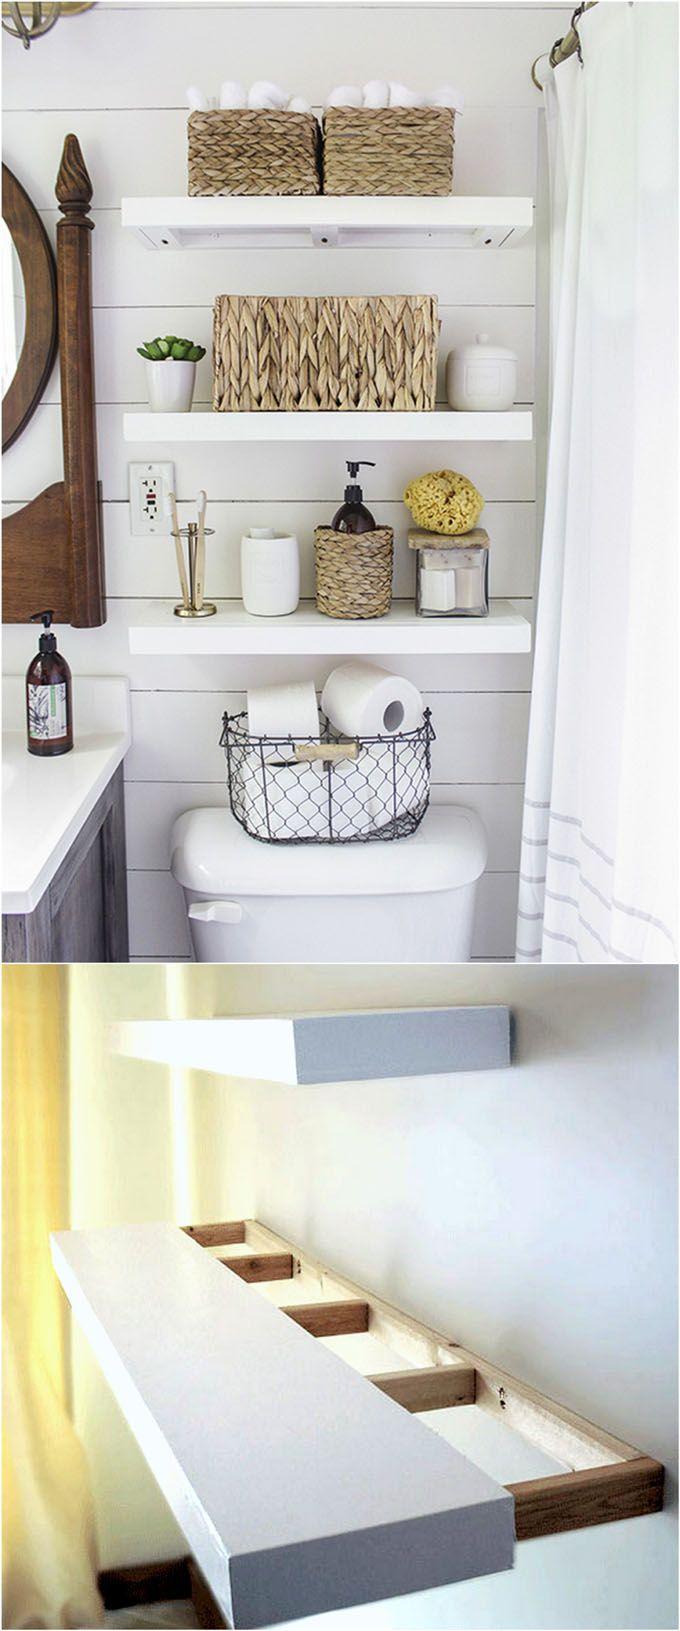 16 Easy And Stylish Diy Floating Shelves Wall Shelves Floating